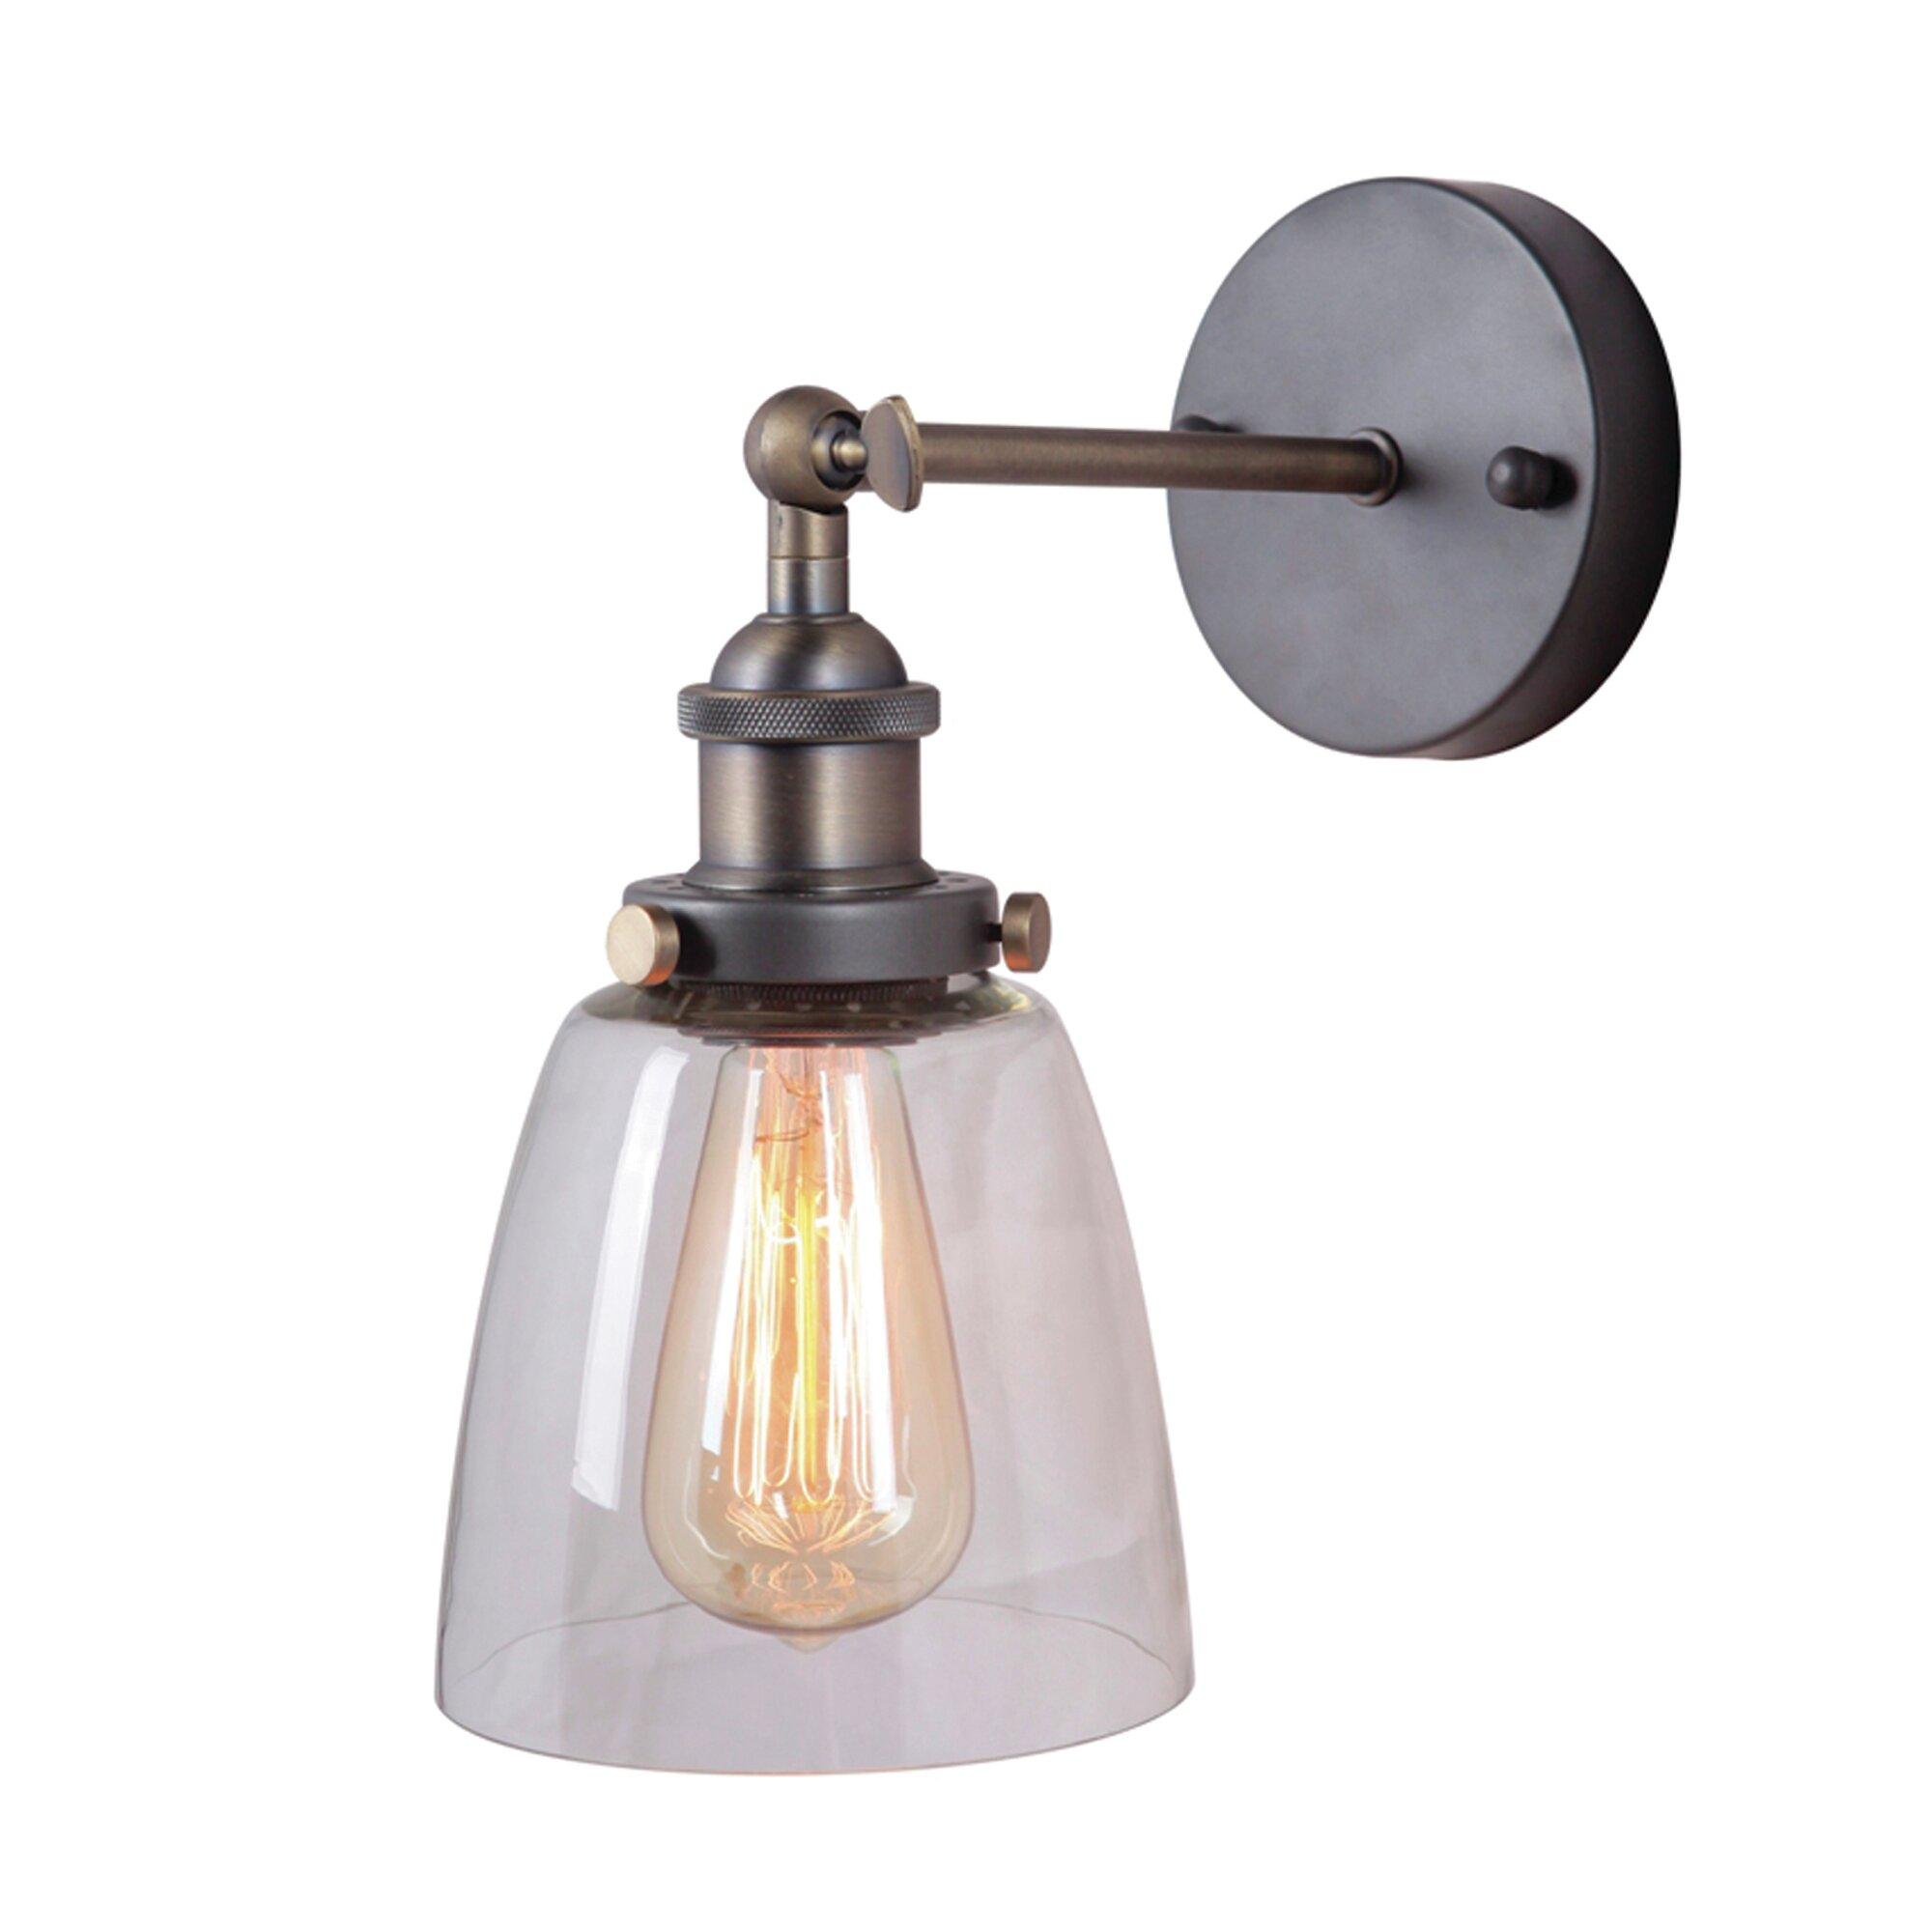 Yosemite home decor 1 light wall sconce reviews wayfair for Wayfair industrial lamp